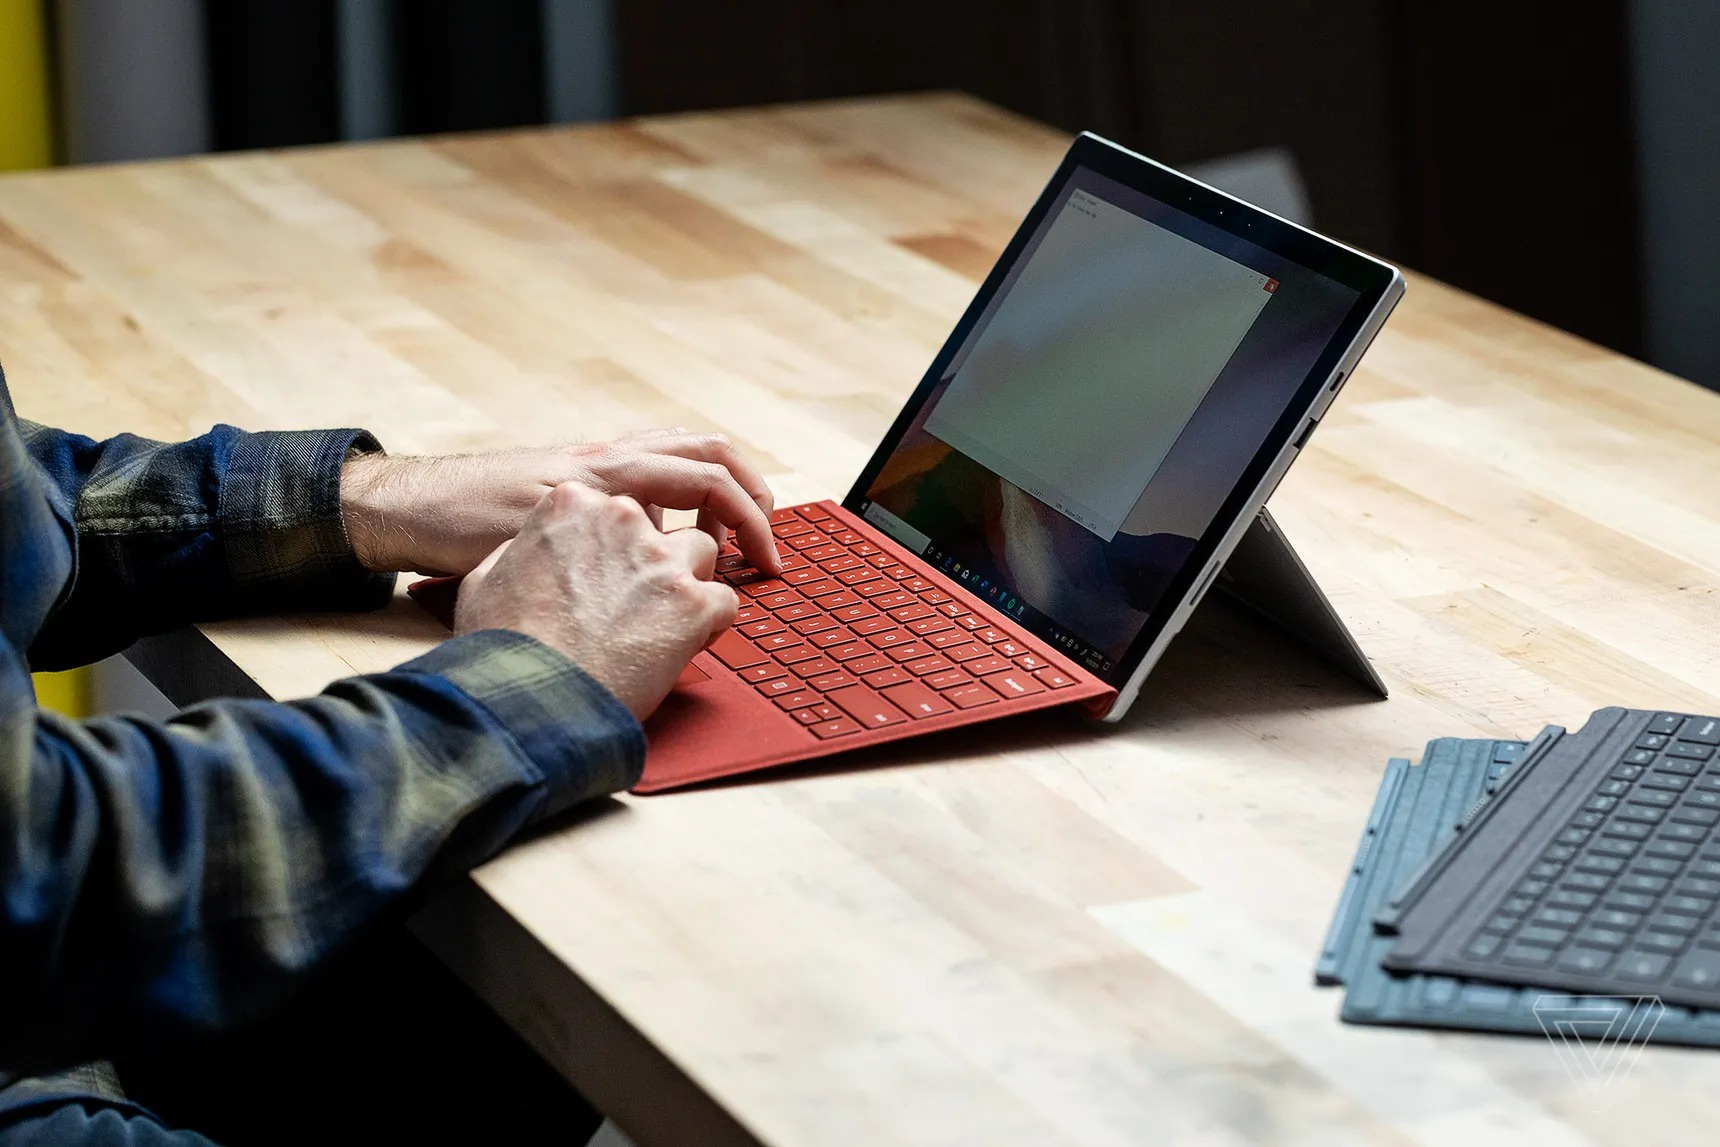 Tai sao webcam laptop xau te va cach khac phuc? anh 4